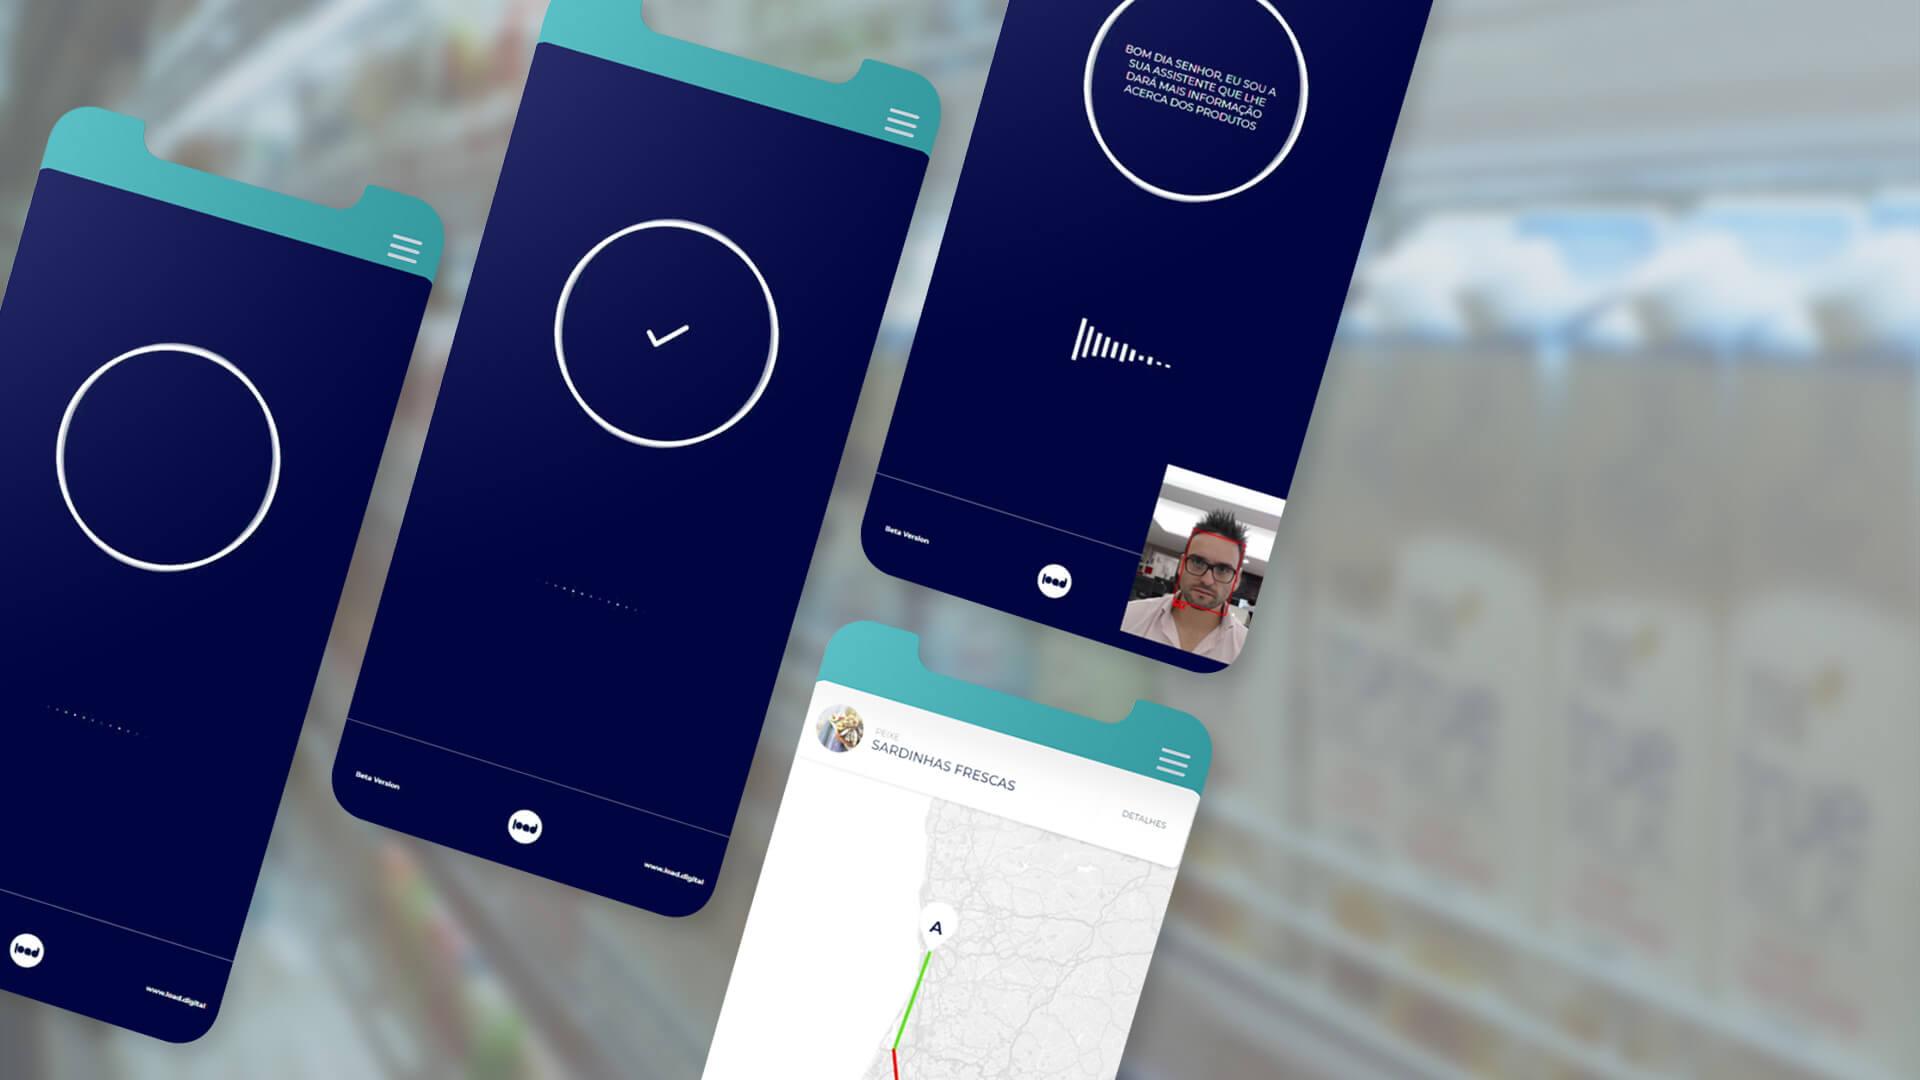 load mobile mockup of conversational bots artificial intelligence